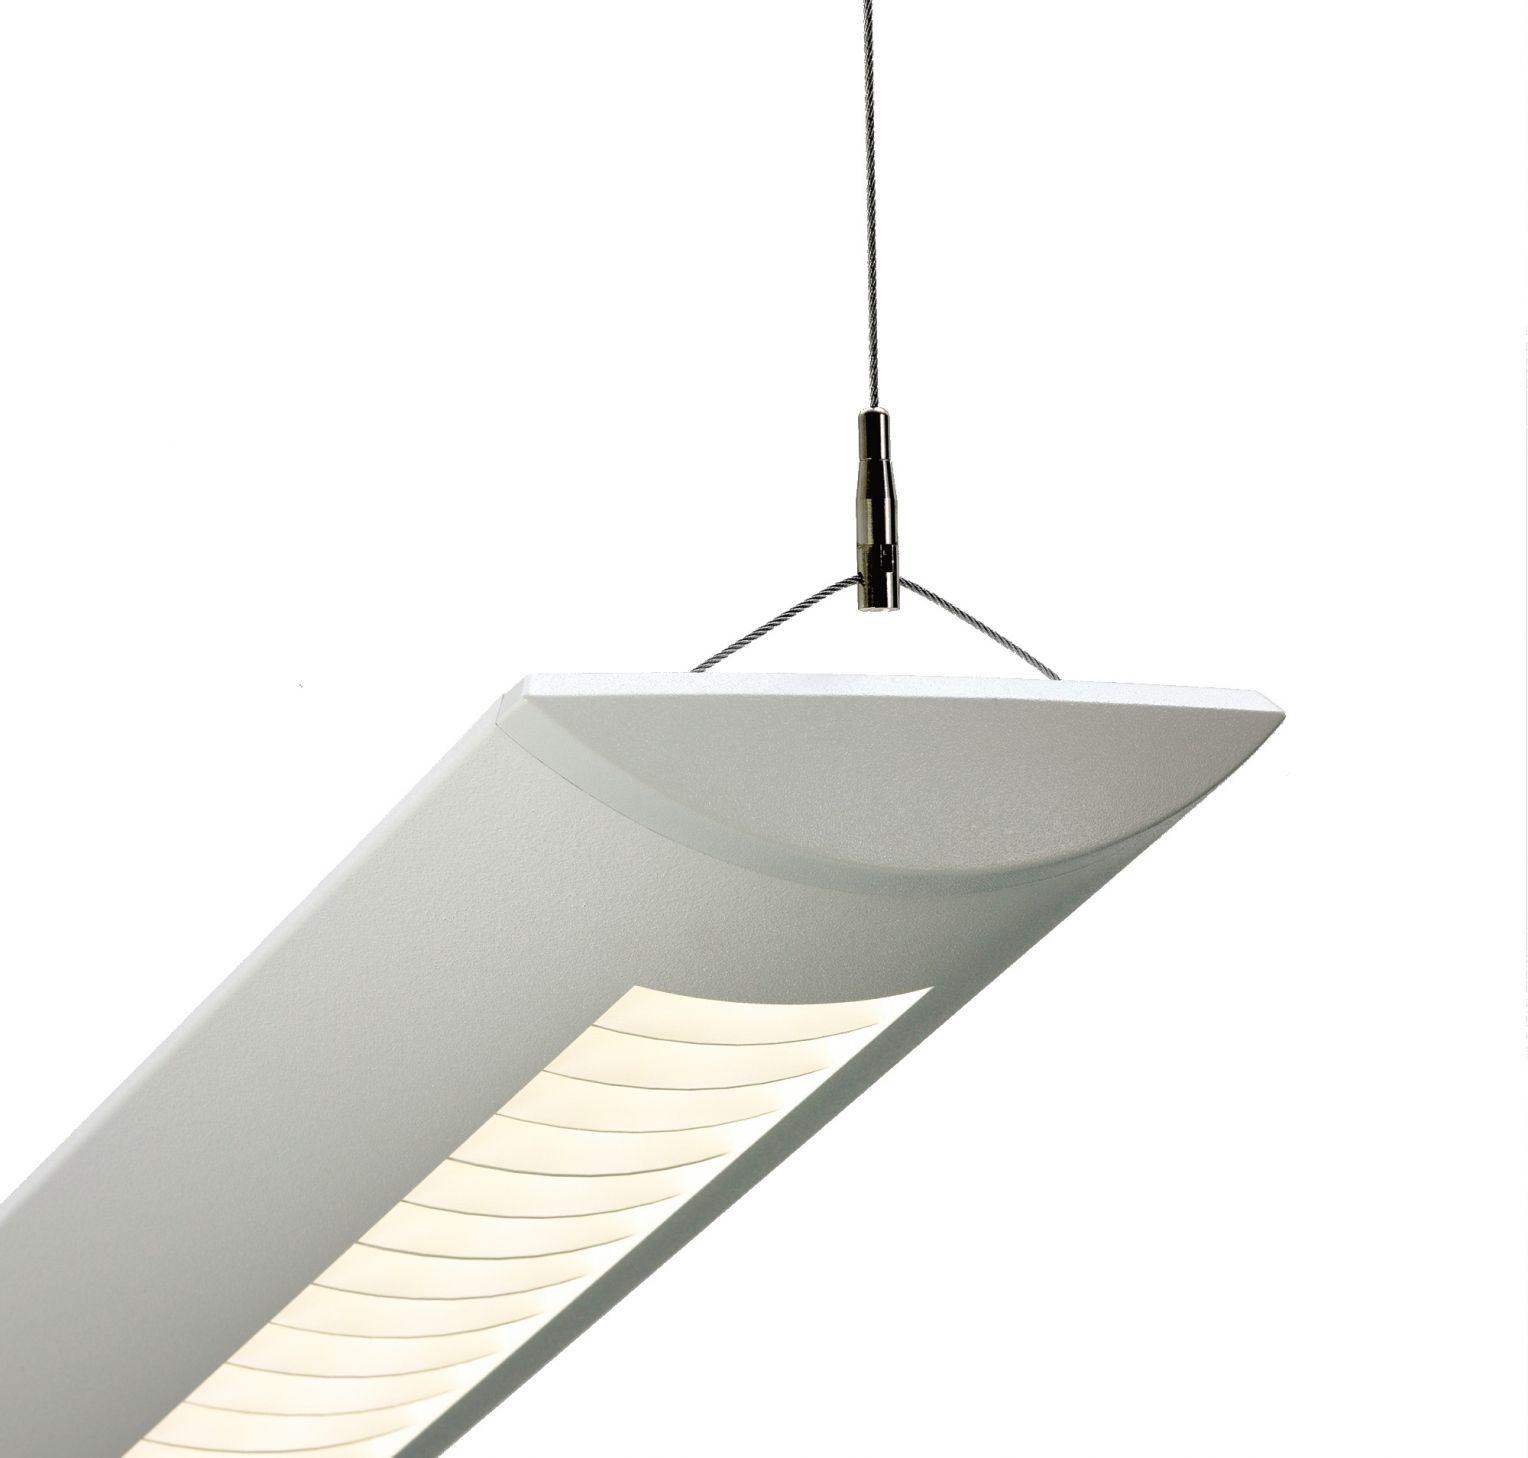 Litecontrol Lighting